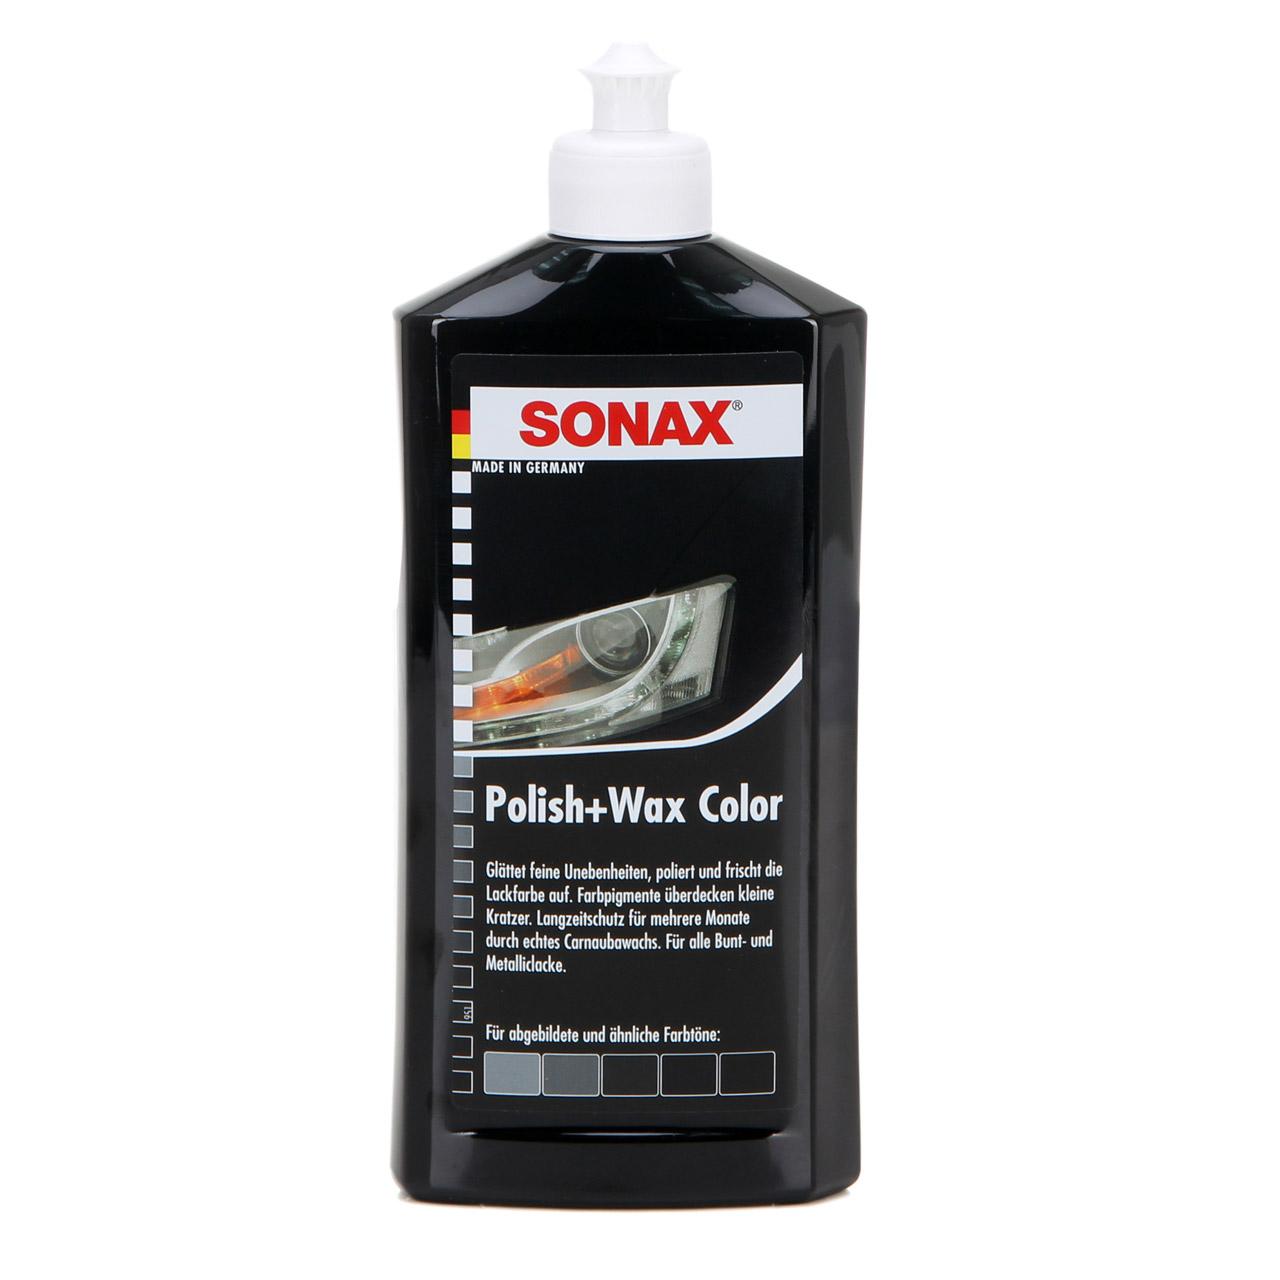 SONAX 296100 POLISH & WAX COLOR Politur & Wachs NanoPro SCHWARZ 500ml